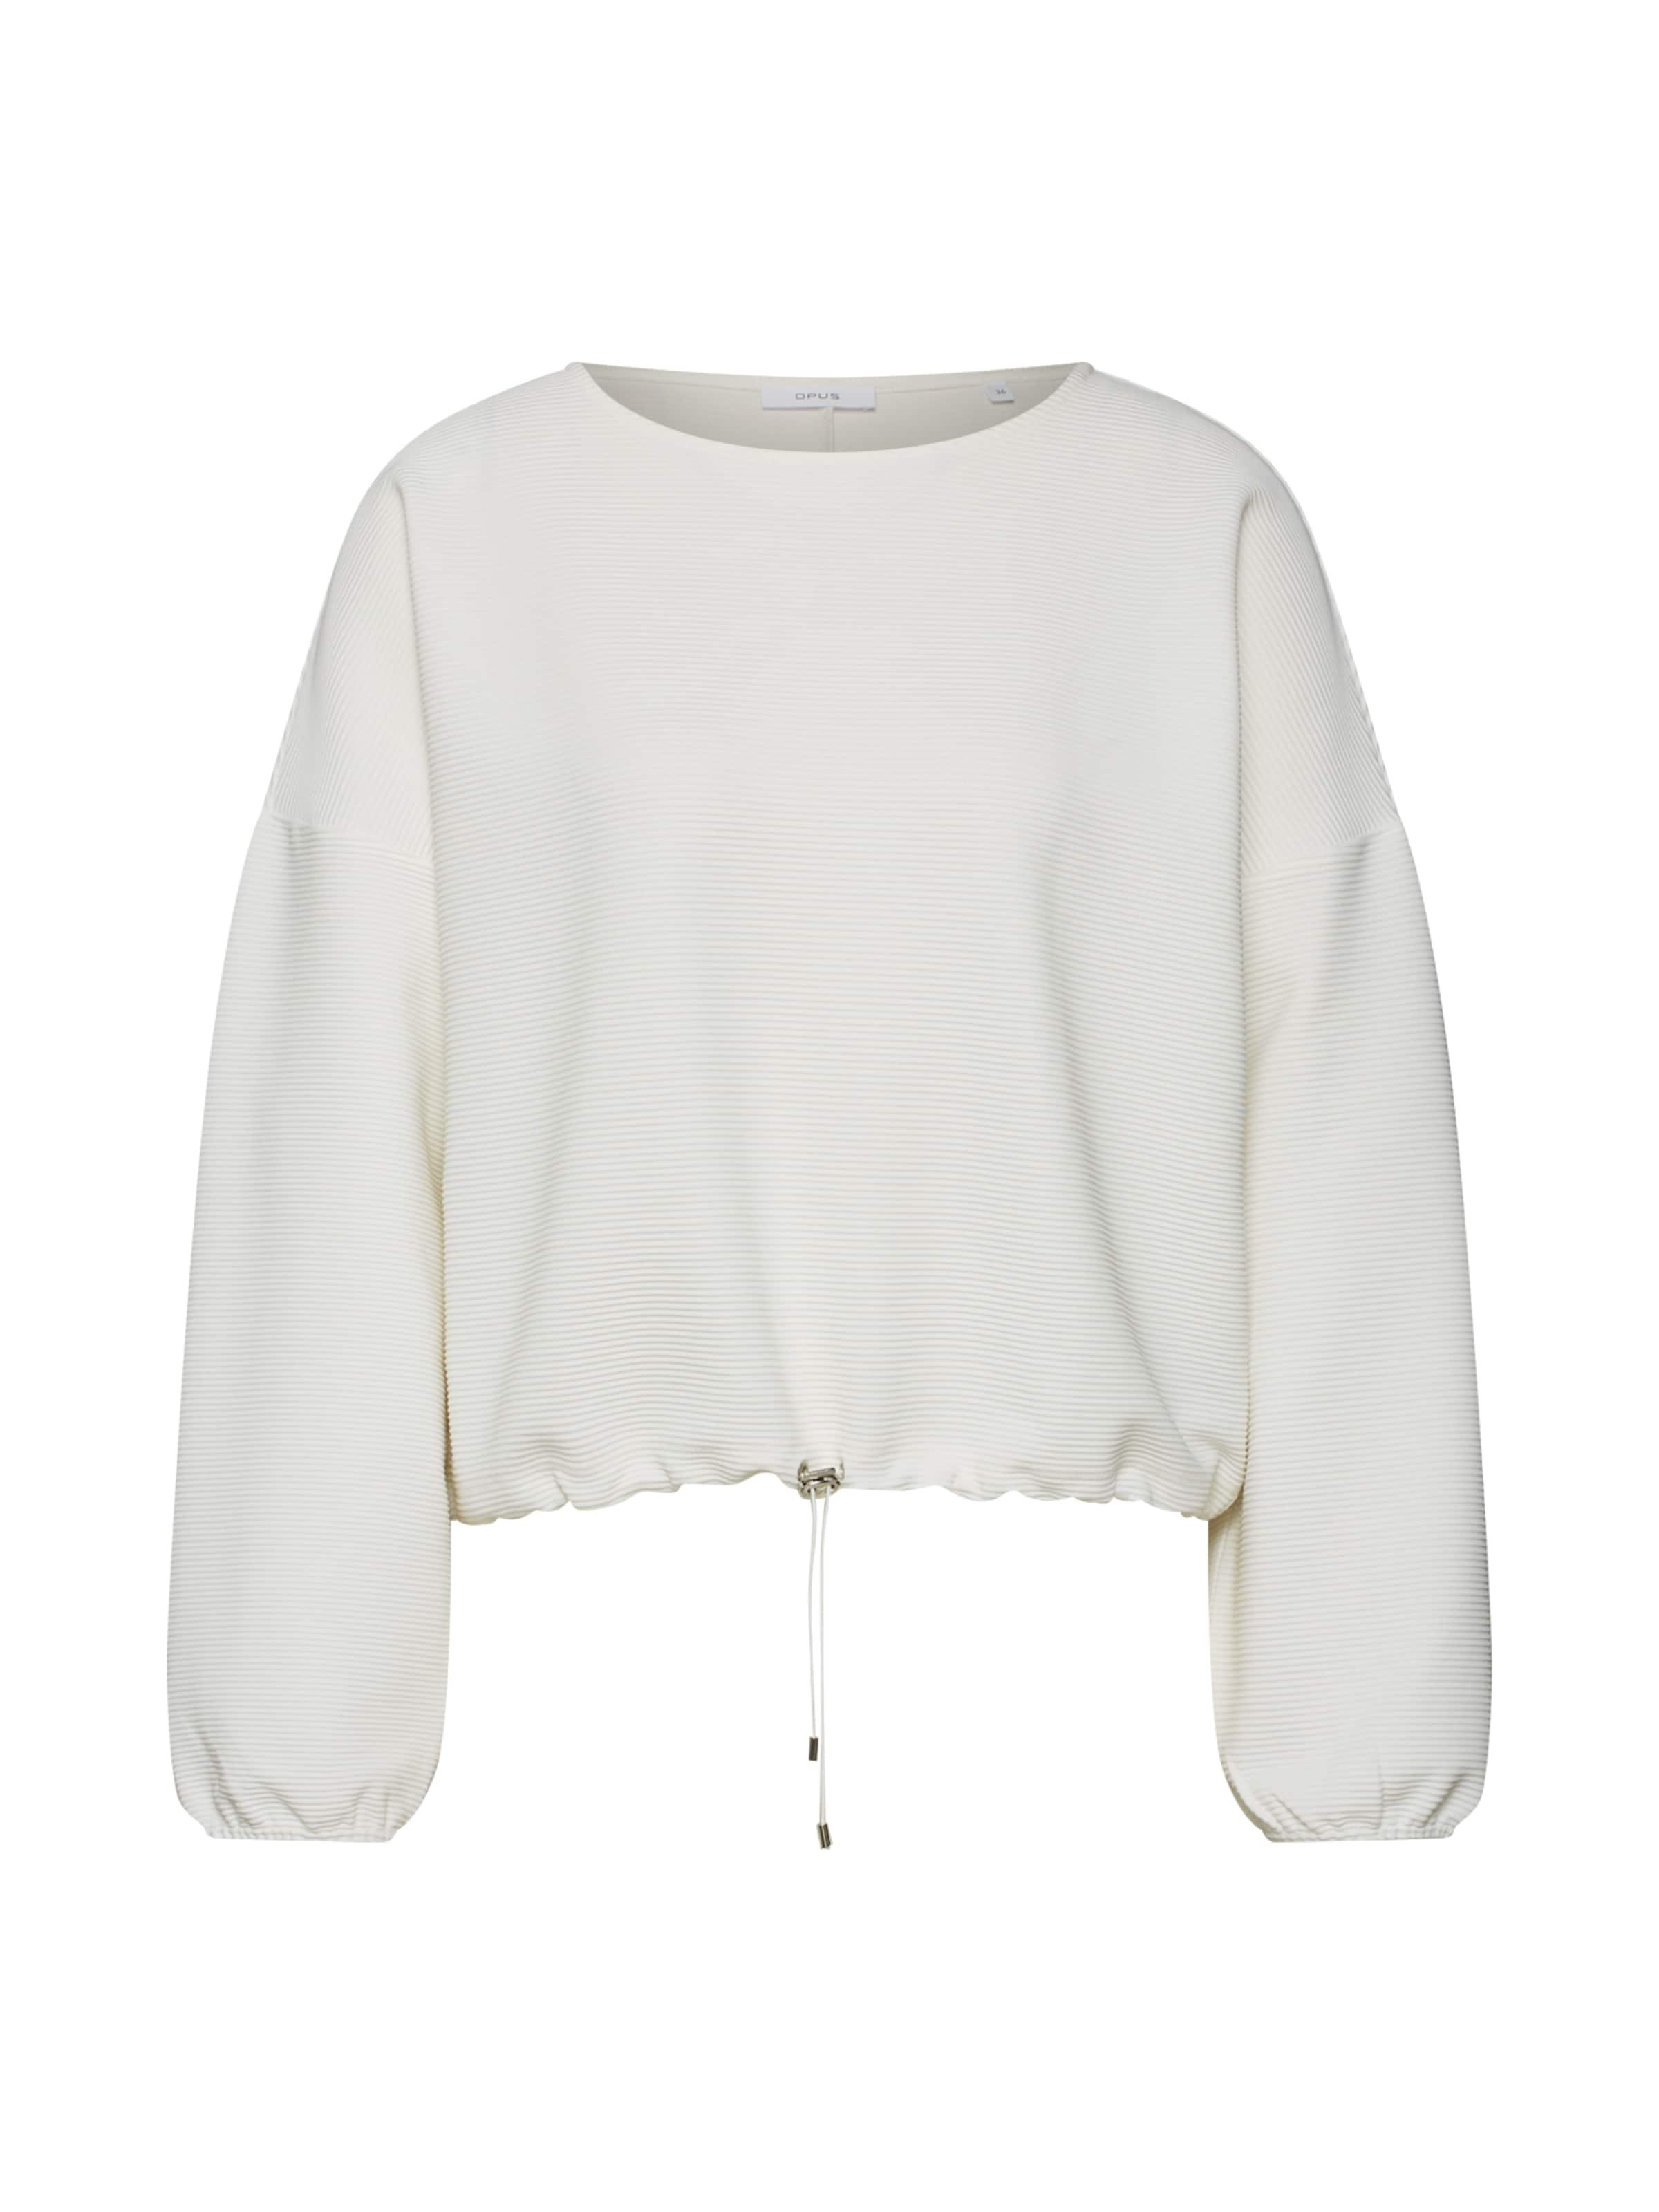 Sweatshirt Sweatshirt Sweatshirt Opus 'goneta' Opus Creme 'goneta' In In Opus Creme LSzVpUMqG